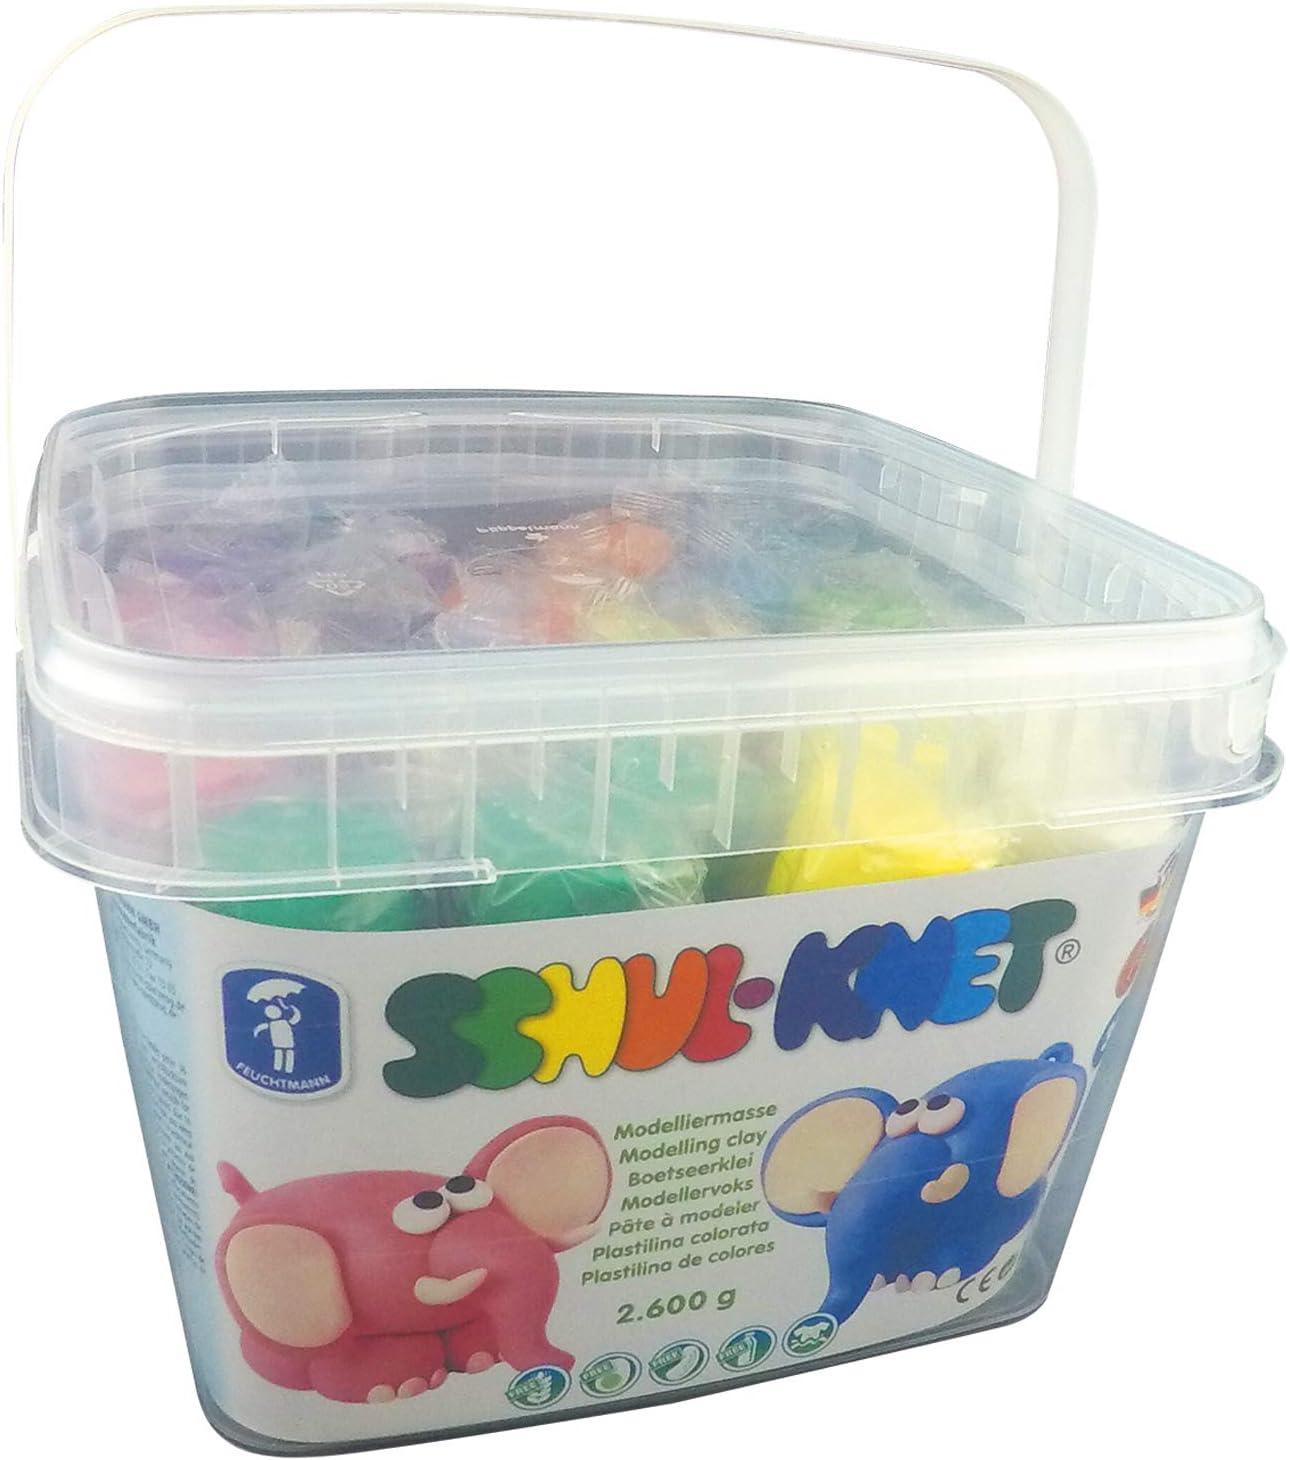 Feuchtmann Schul-Knet Modelling Dough in a Big Bucket